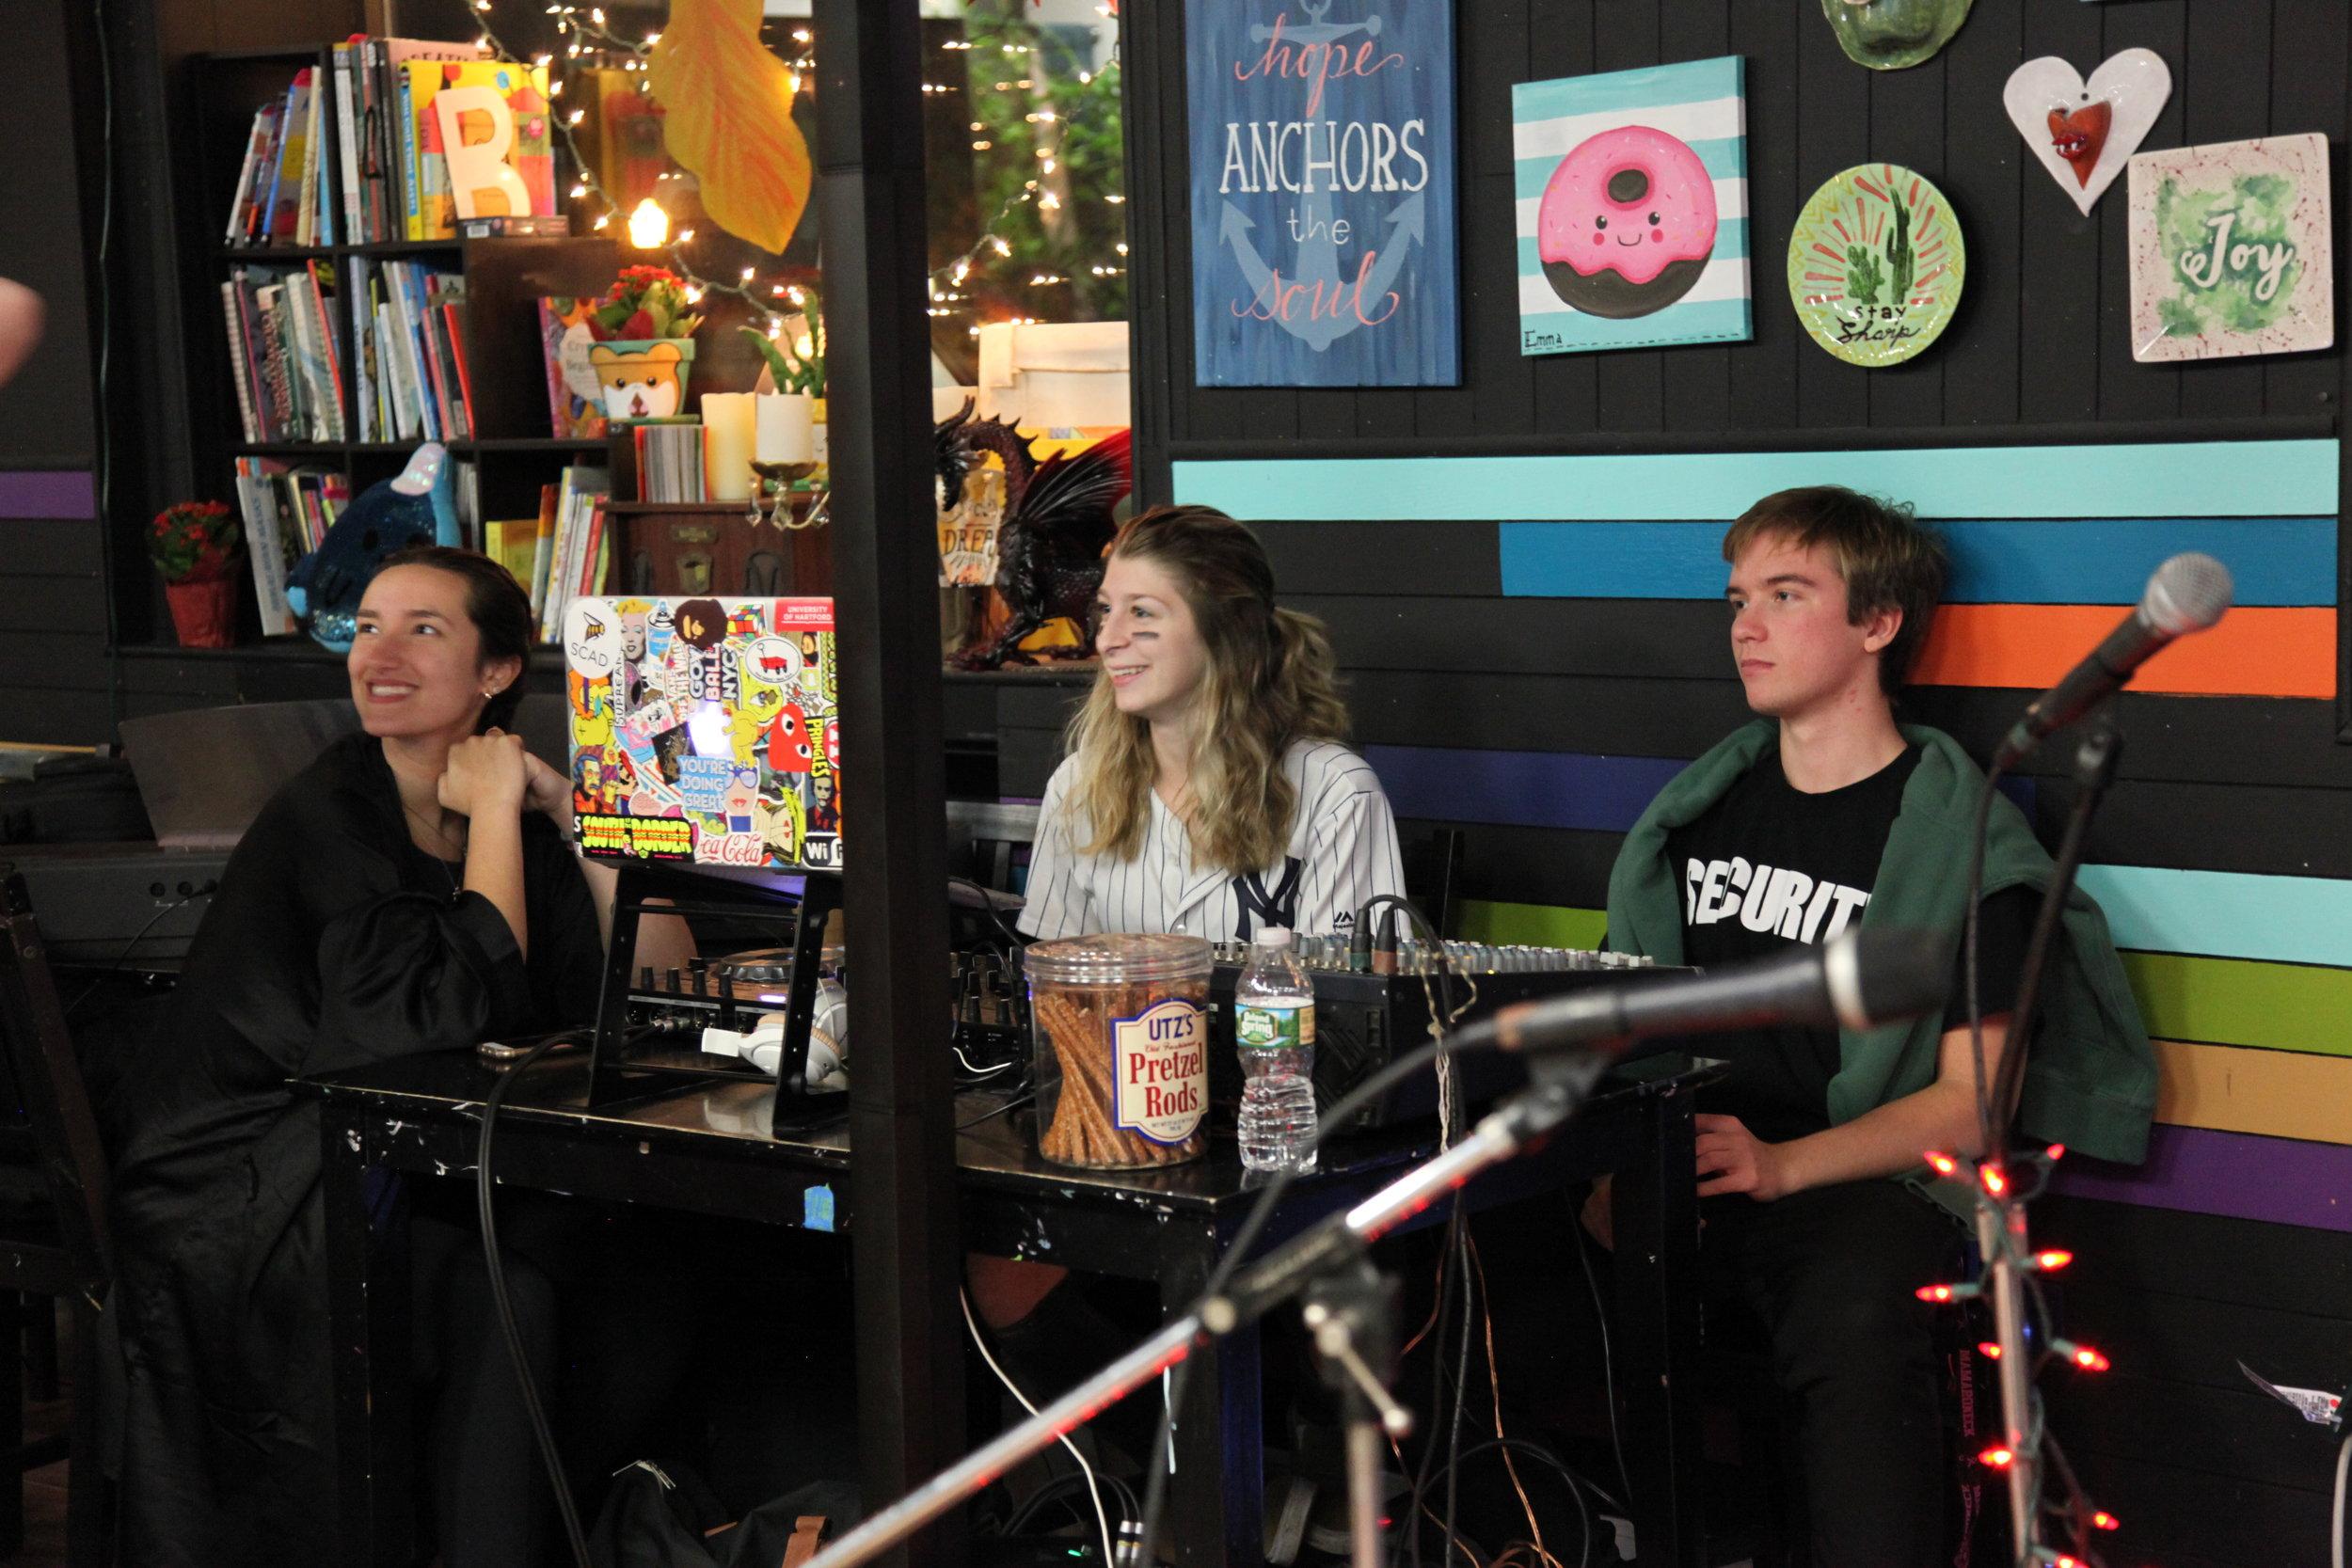 Elle Katsaros, our DJ (center) with Milo Haviland (right) and Madison Crane (left)